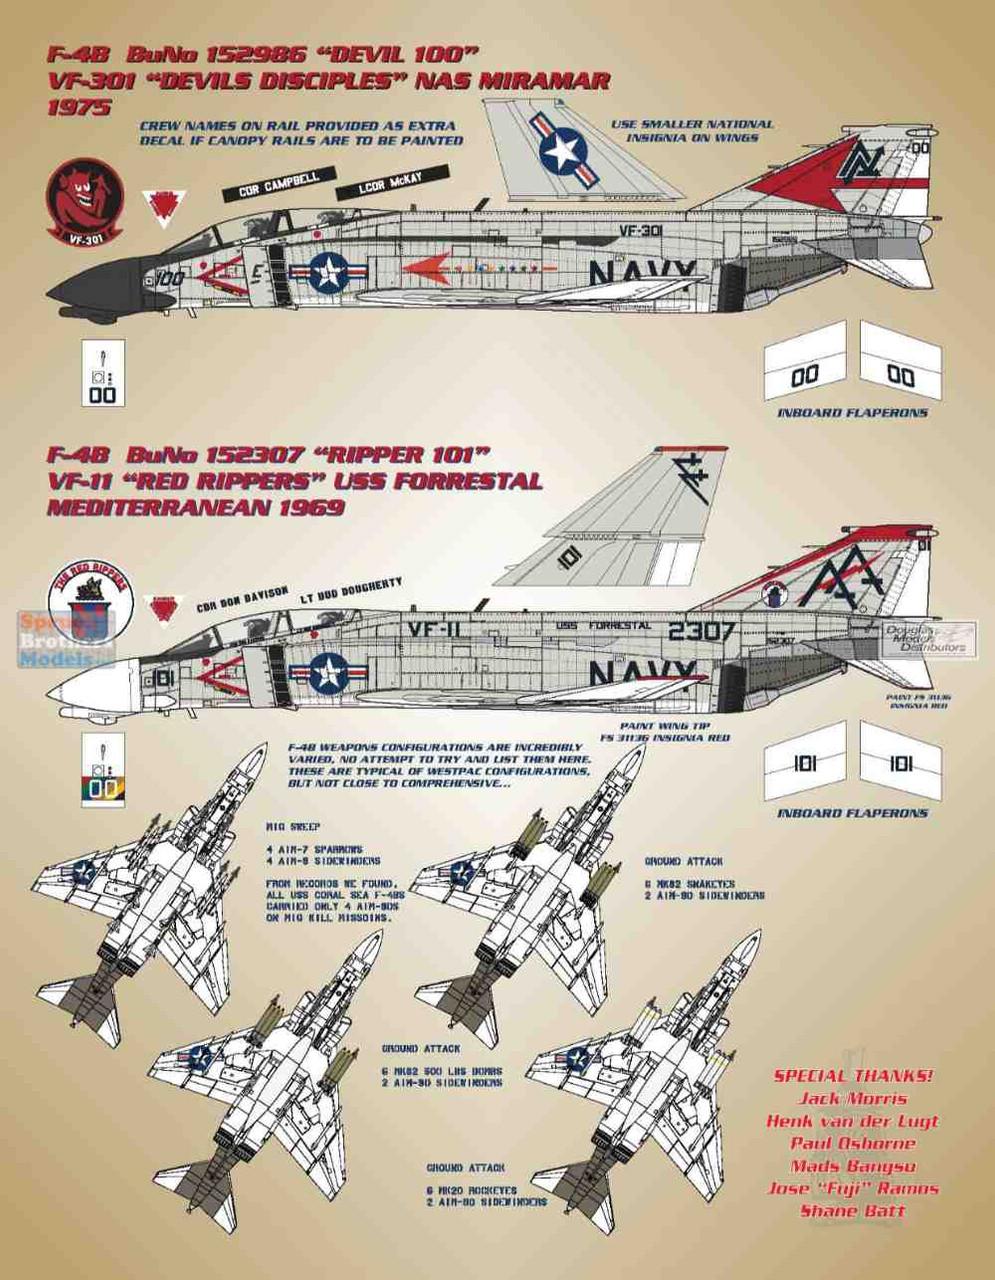 BMA48017 1:48 Bullseye Model Aviation Decals - F-4B Phantom II 'Fleet Phantoms I'